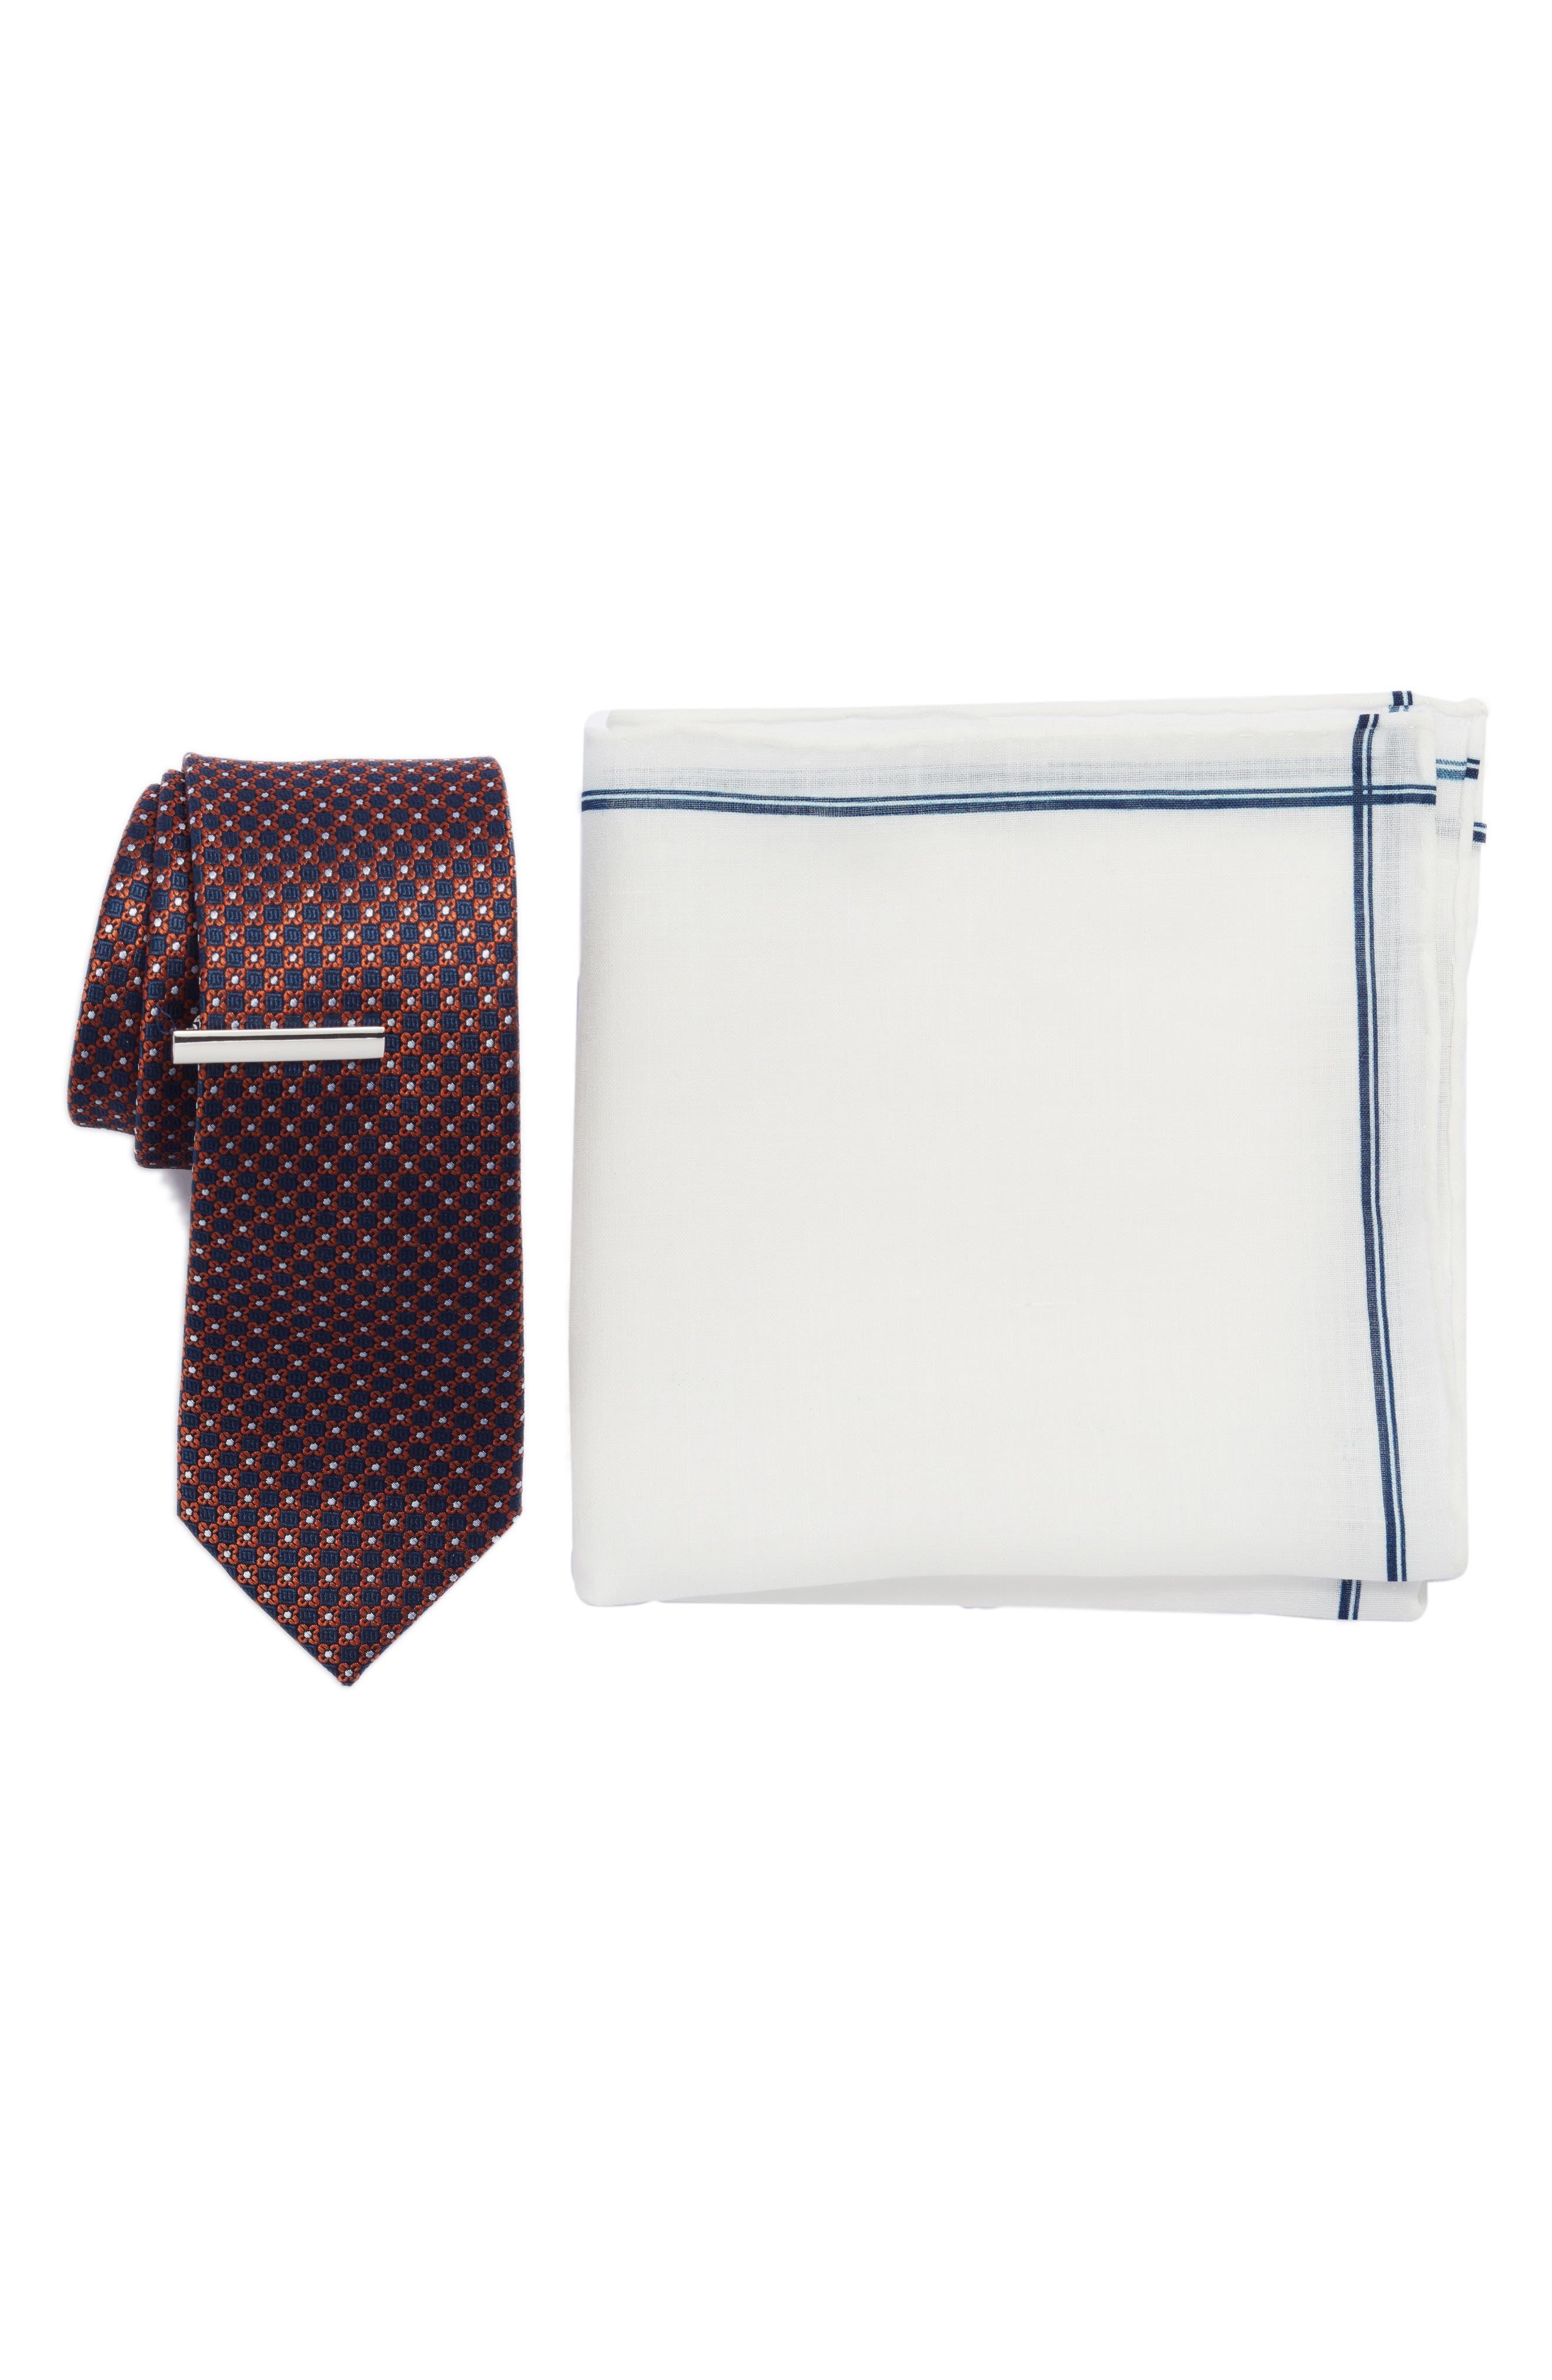 Flower Network 3-Piece Skinny Tie Style Box,                         Main,                         color, Orange